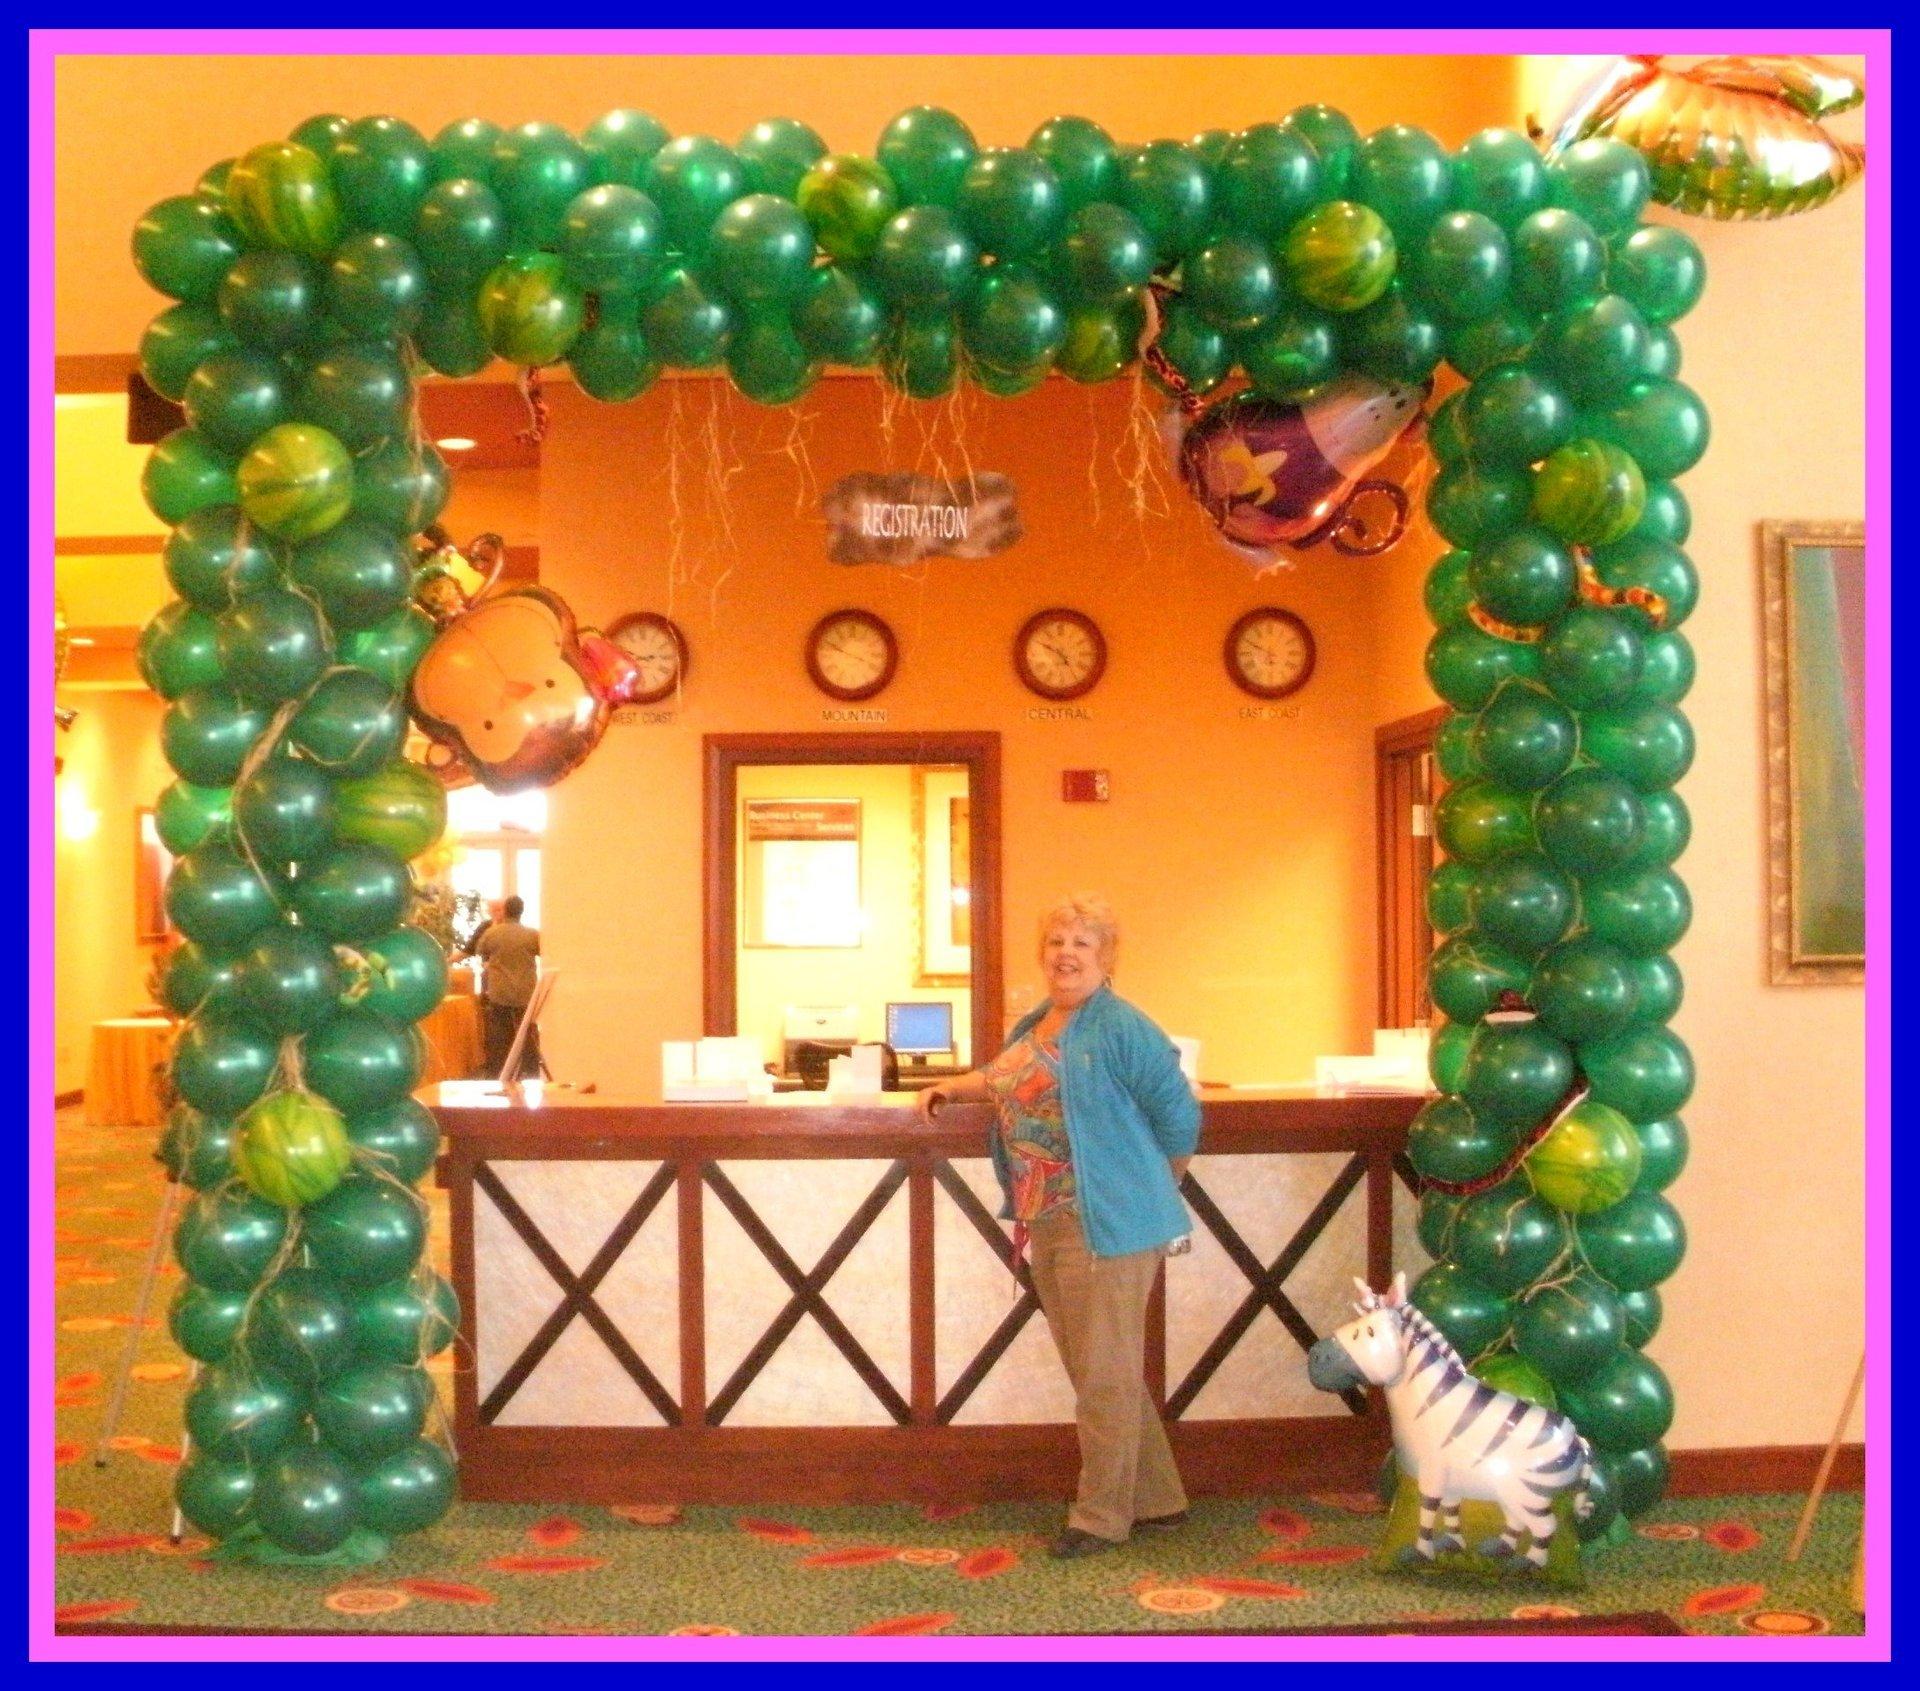 Registration Arch Jungle Theme